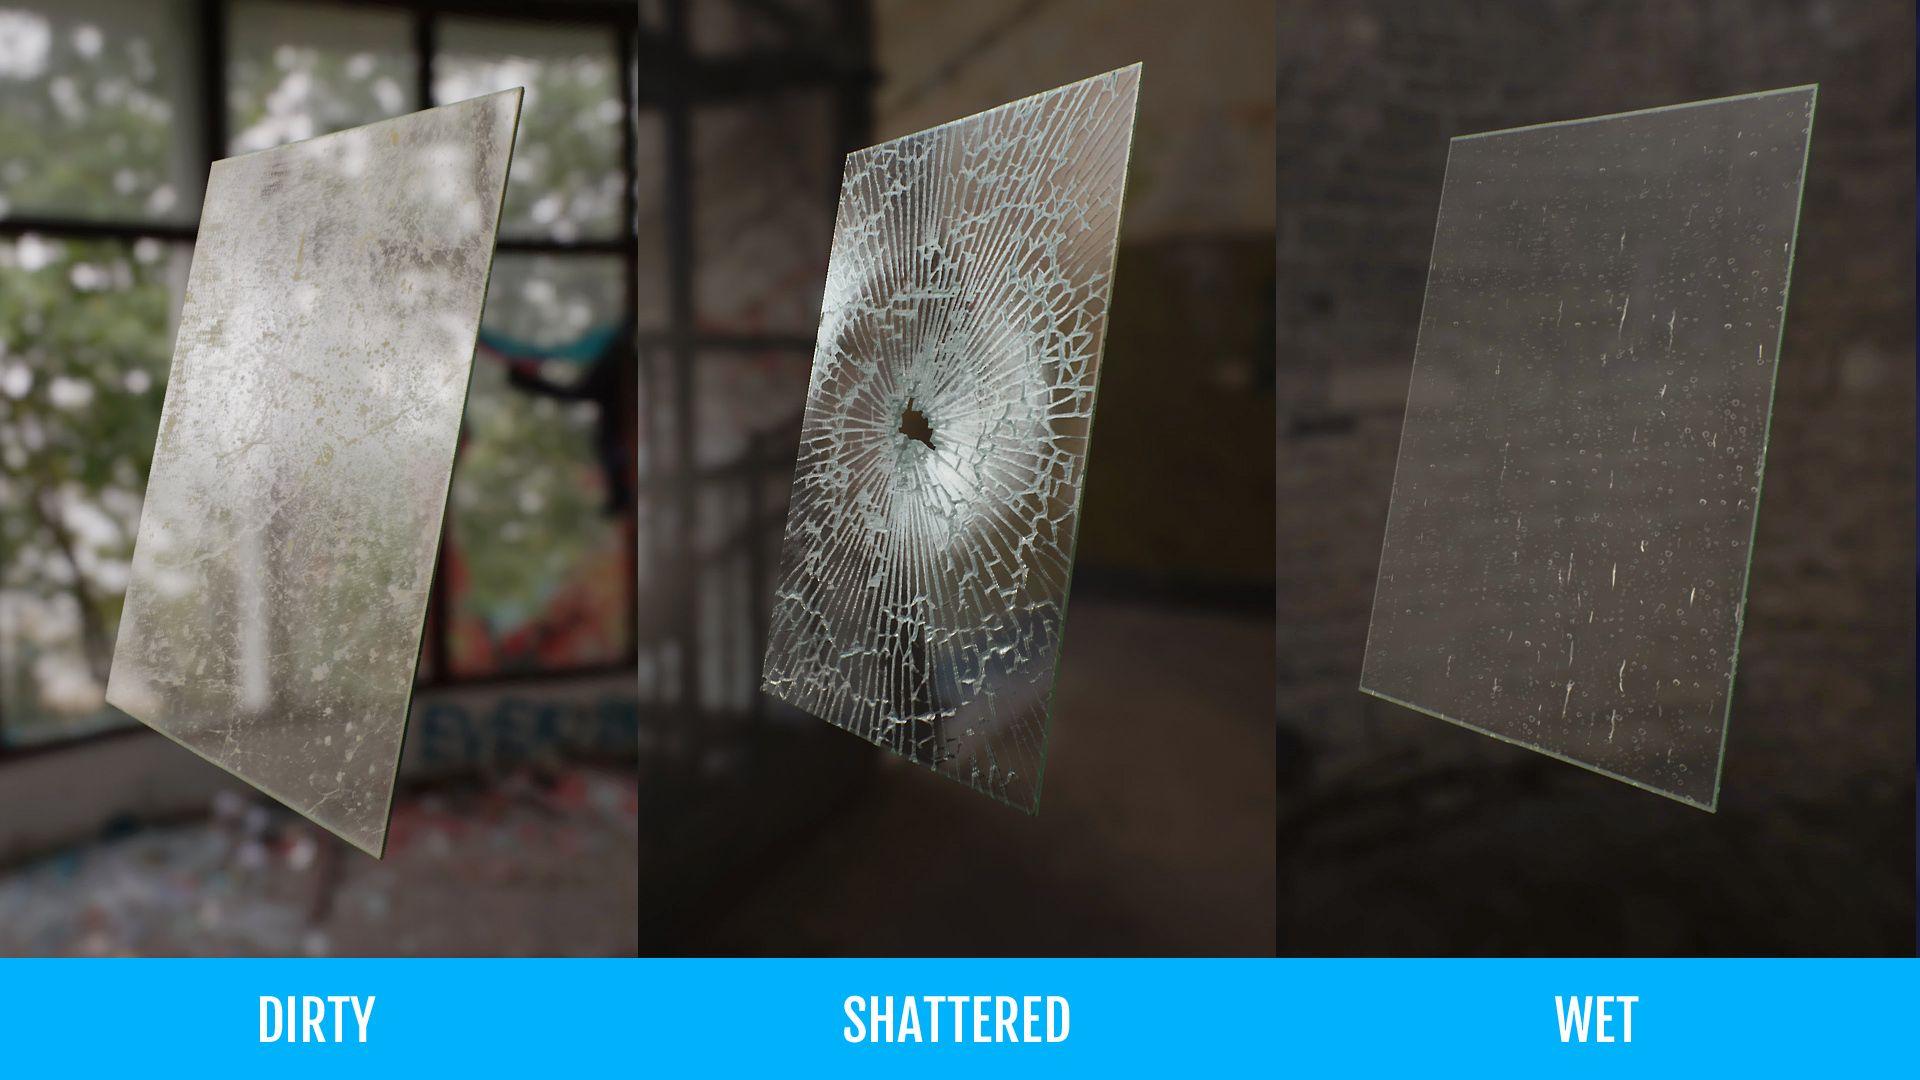 UE4 Material – Glass | Unreal Engine 4 blog | Unreal engine